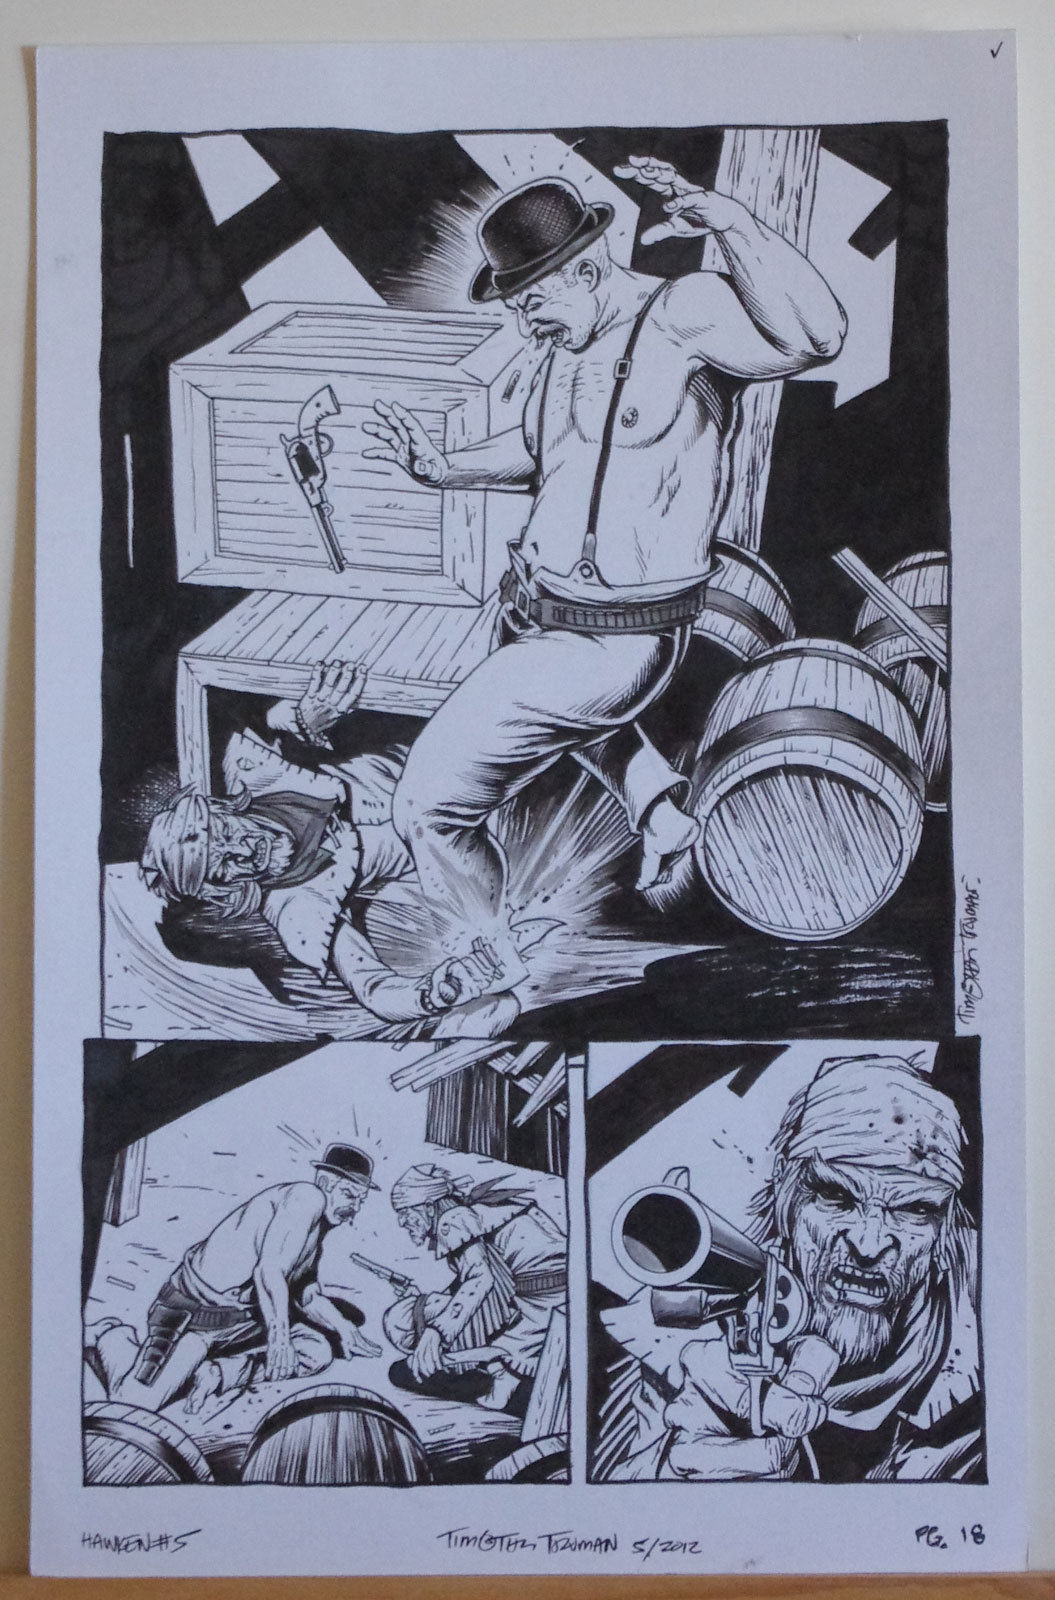 TIMOTHY TRUMAN original art, HAWKEN #5, Pg #18, Knife Fight,Guns, 11